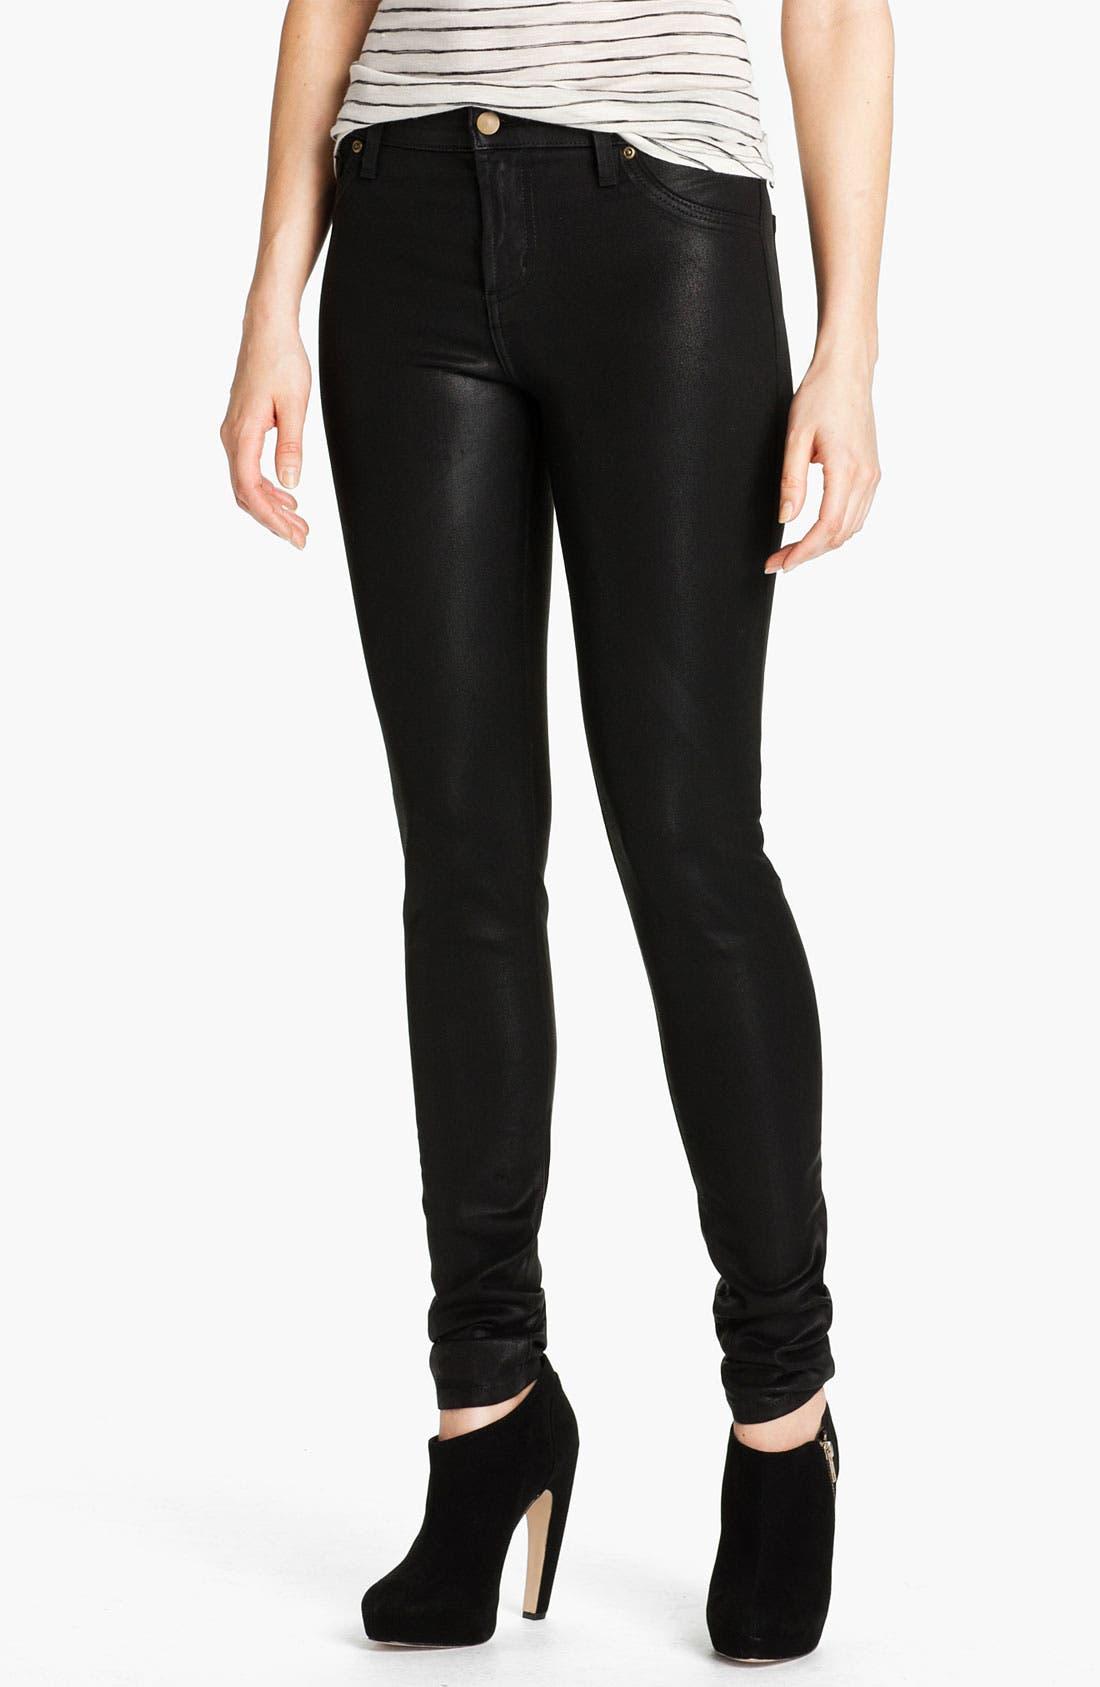 Sarah & George Coated Denim Jeans,                         Main,                         color, Black